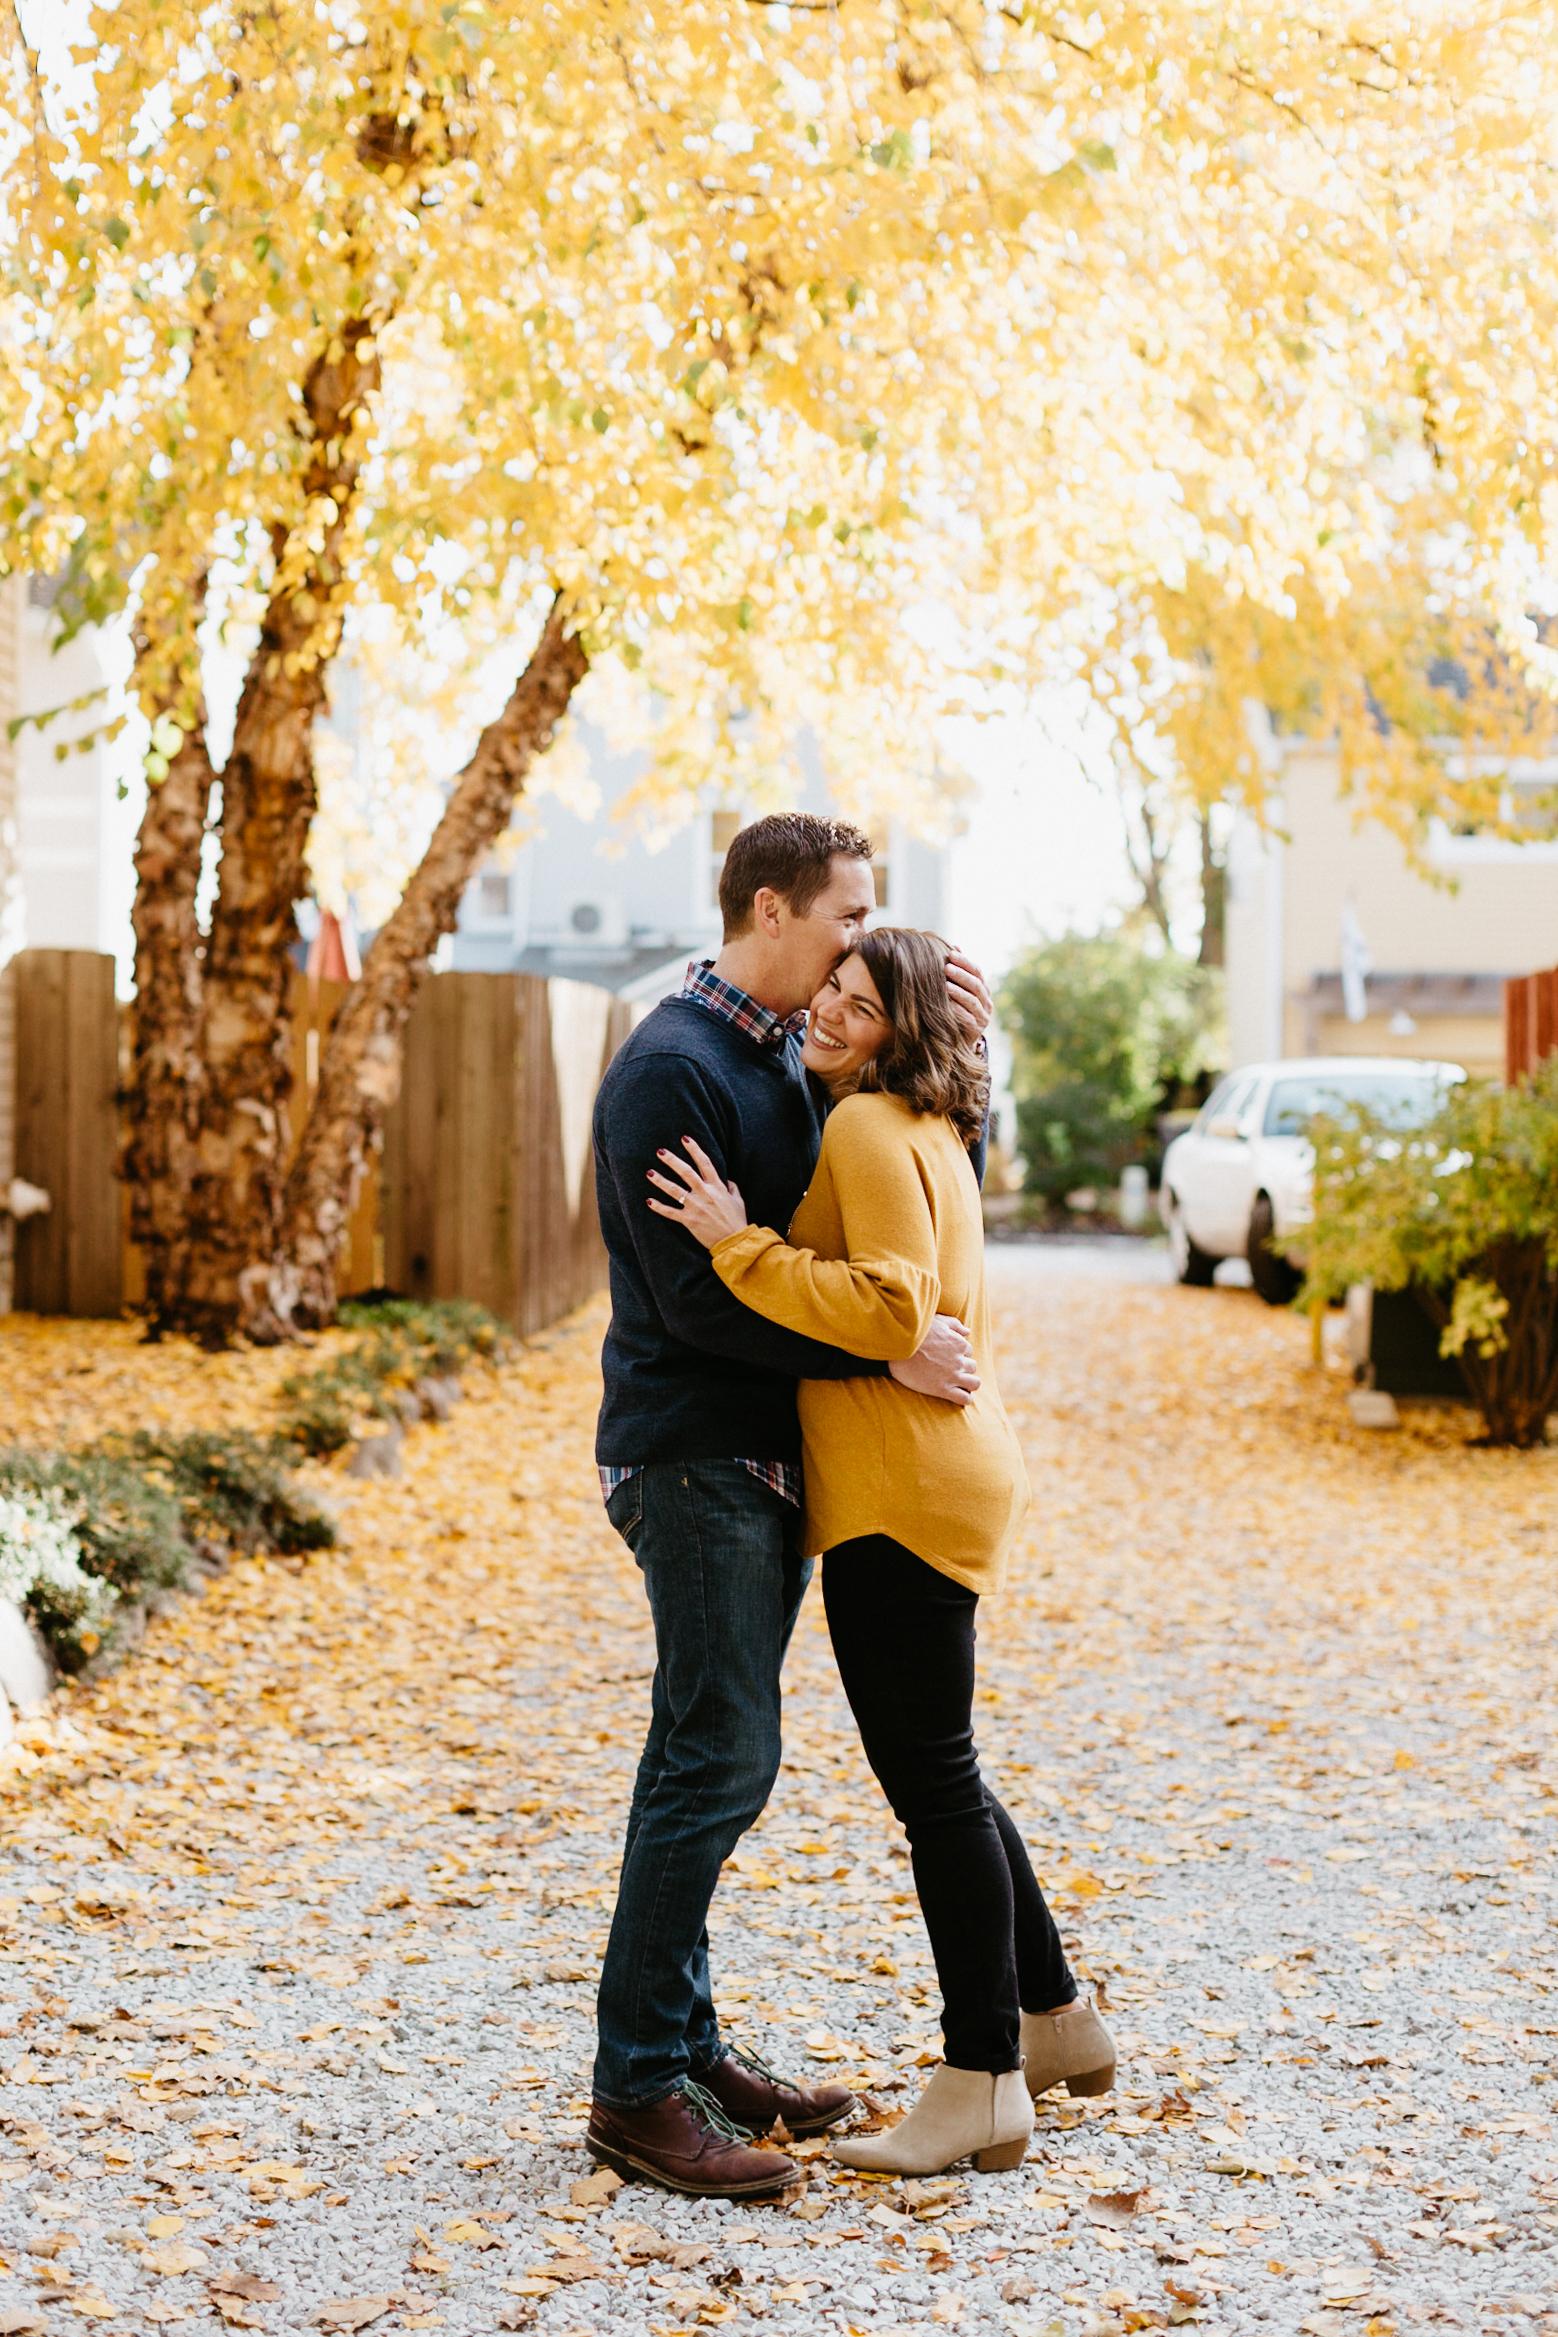 18-11-03 Stephanie and Michael Engagement Edited-45.jpg